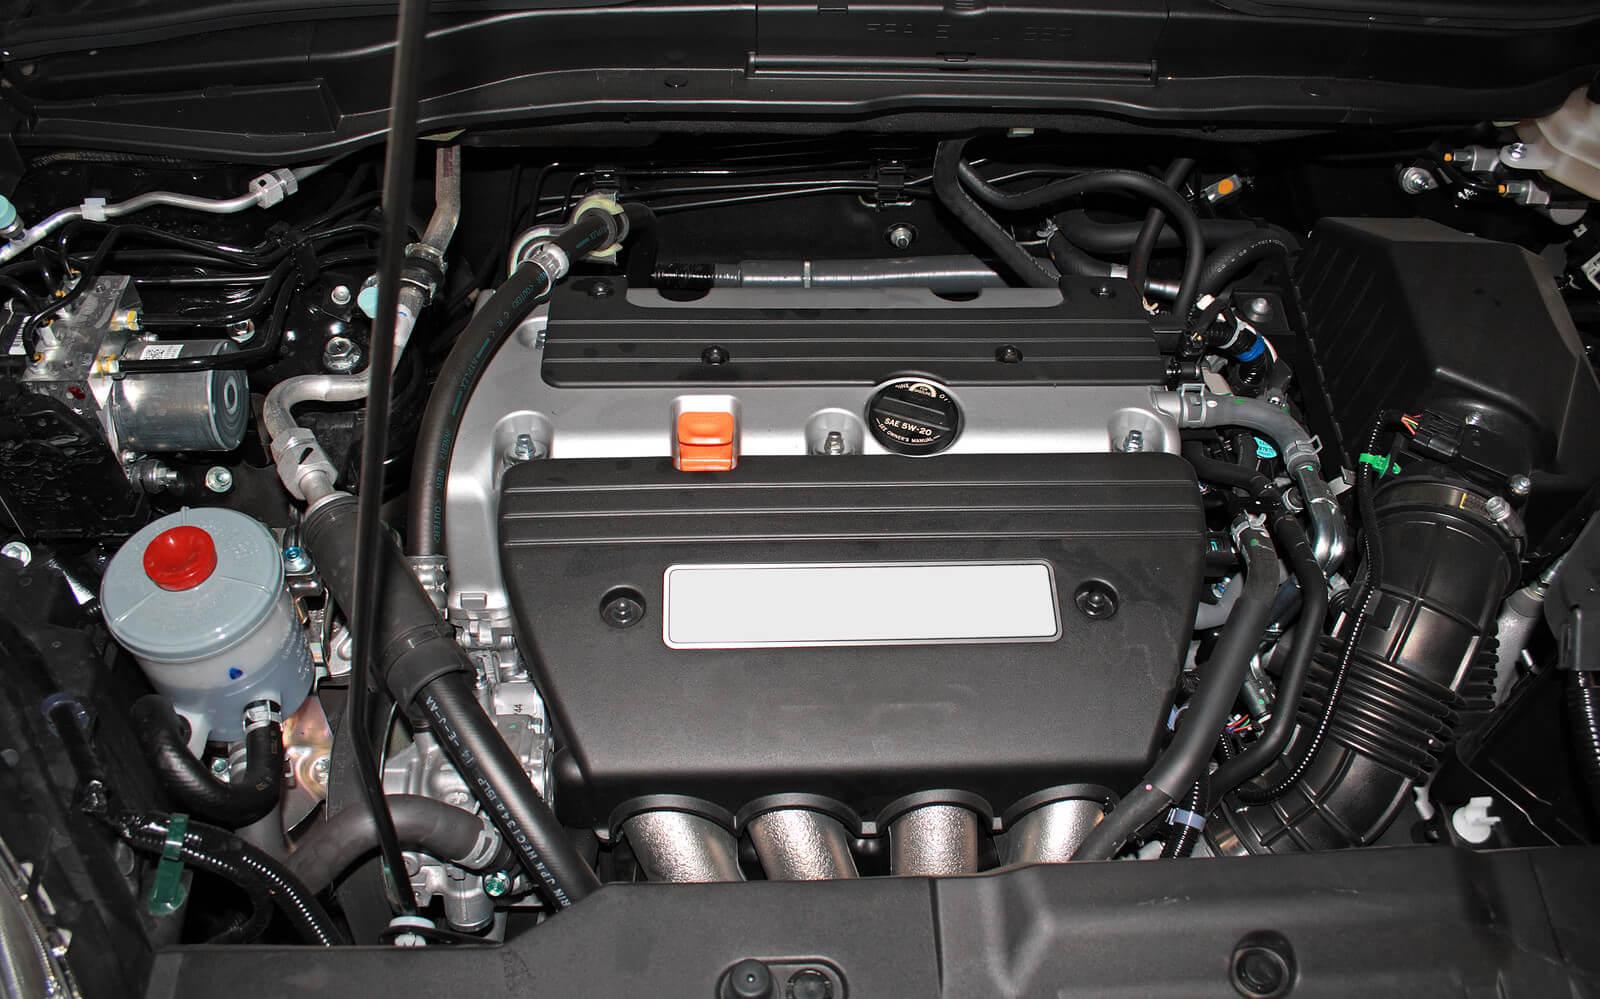 Auto Engine Repair Canstockphoto10860026 Thunderbolt